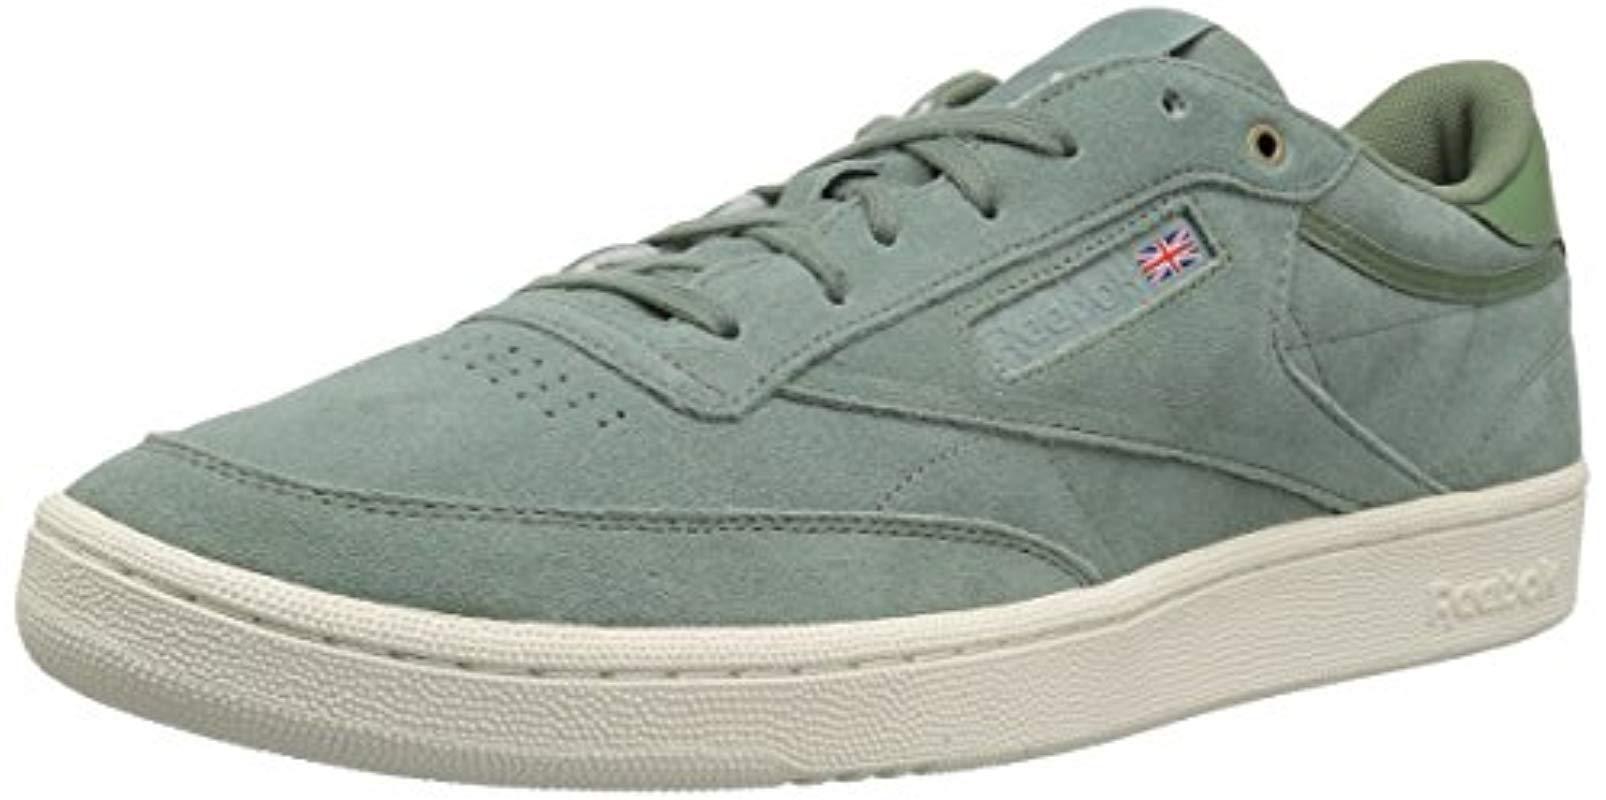 1629cc8d179 Lyst - Reebok Club C 85 Mcc Sneaker in Green for Men - Save 46%